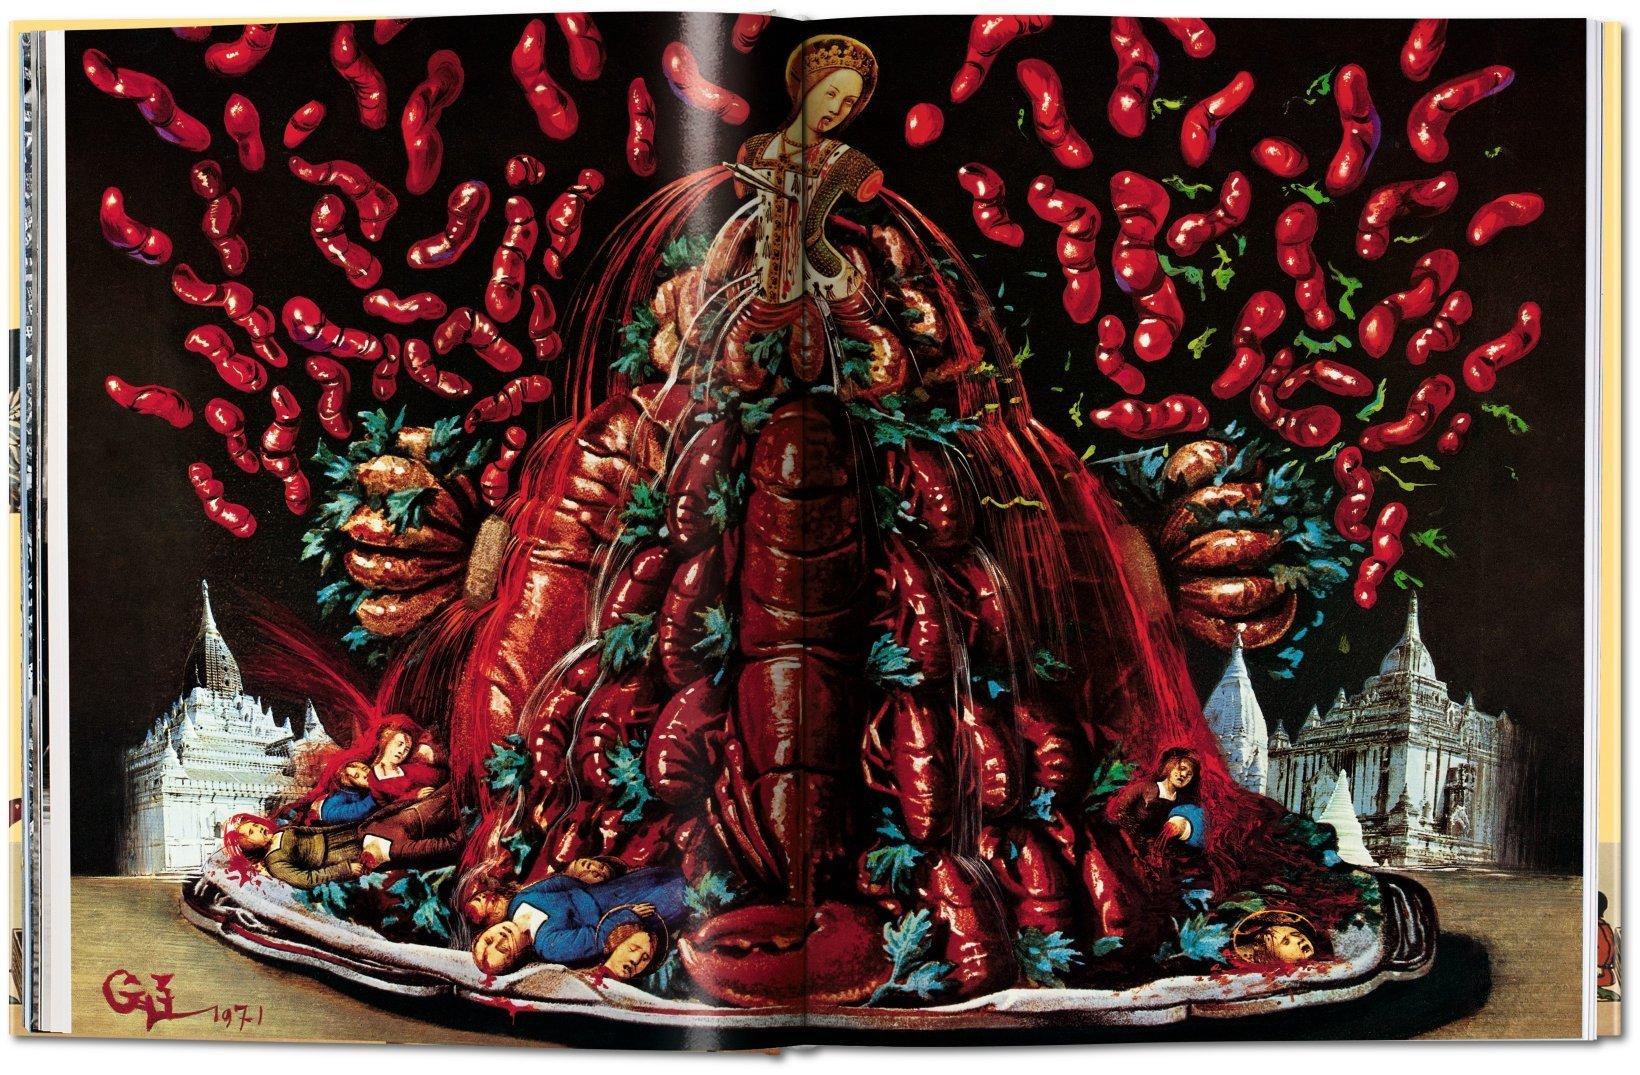 The Cookbook by Dali: Les diners de Gala